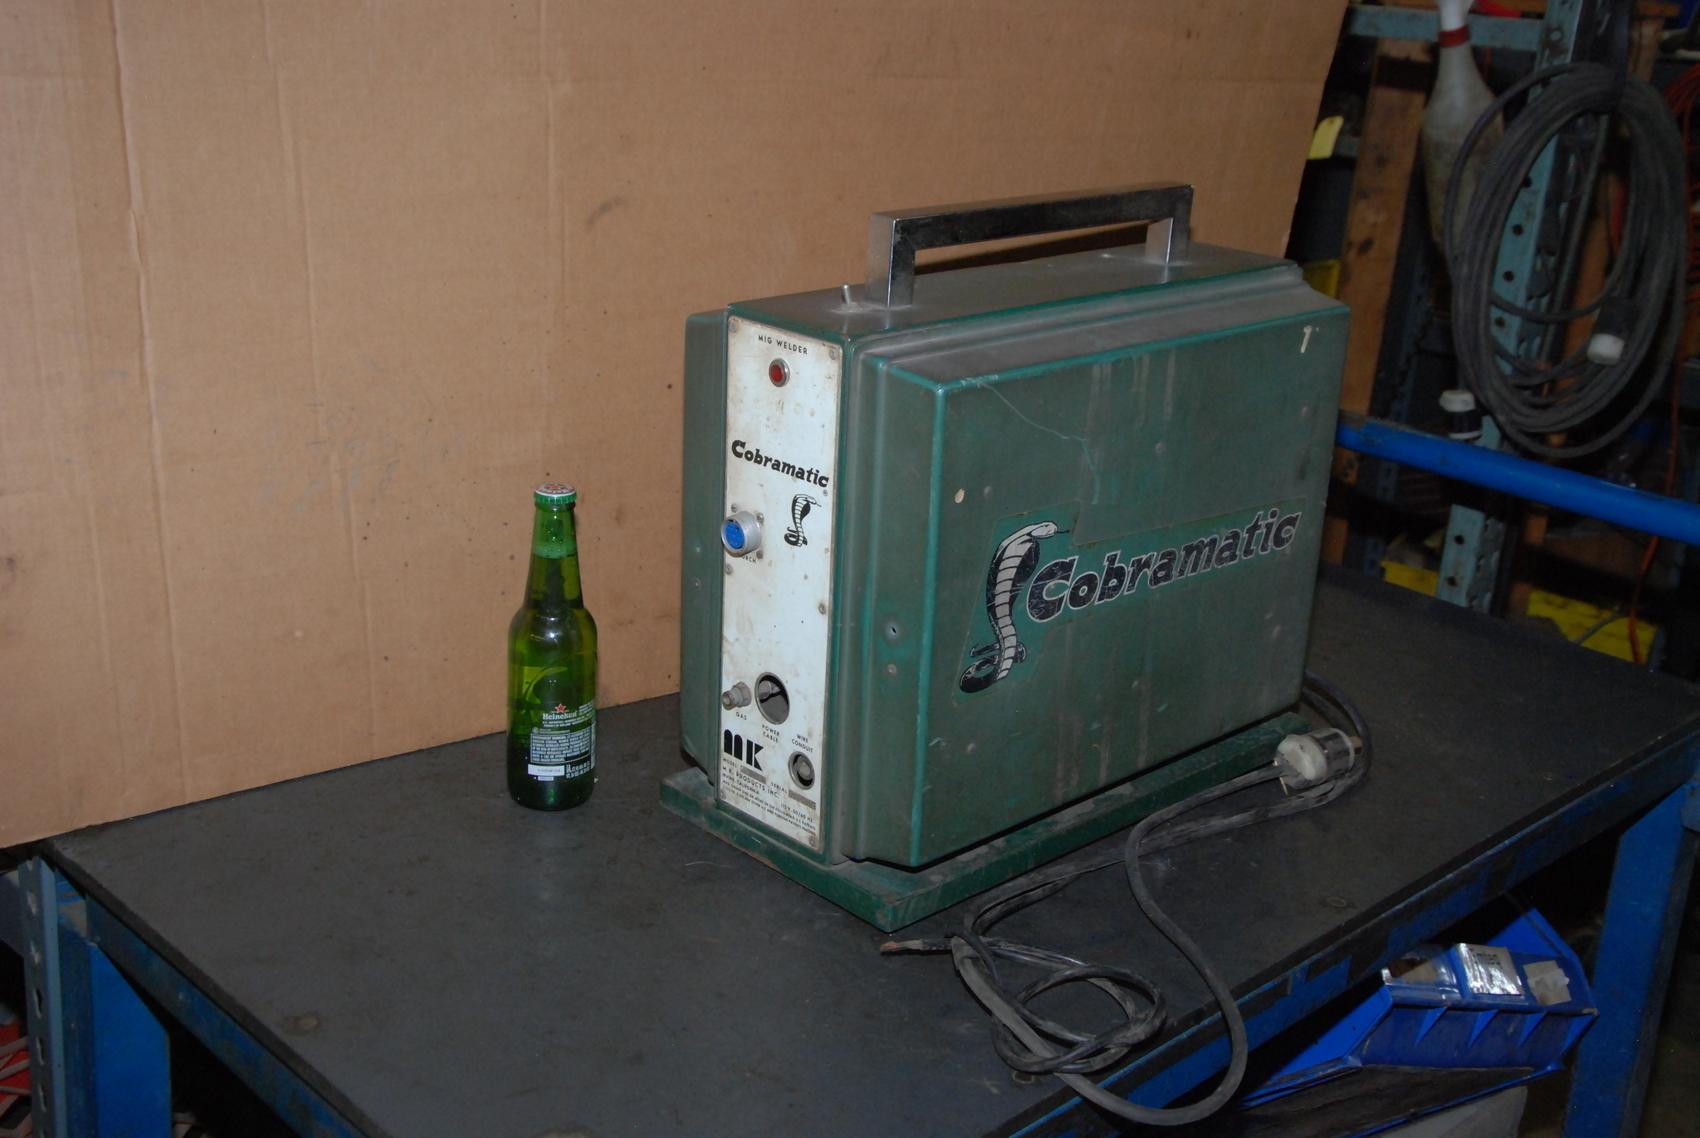 MK Products MK-3A Portable MIG Wire Feeder Cobramatic